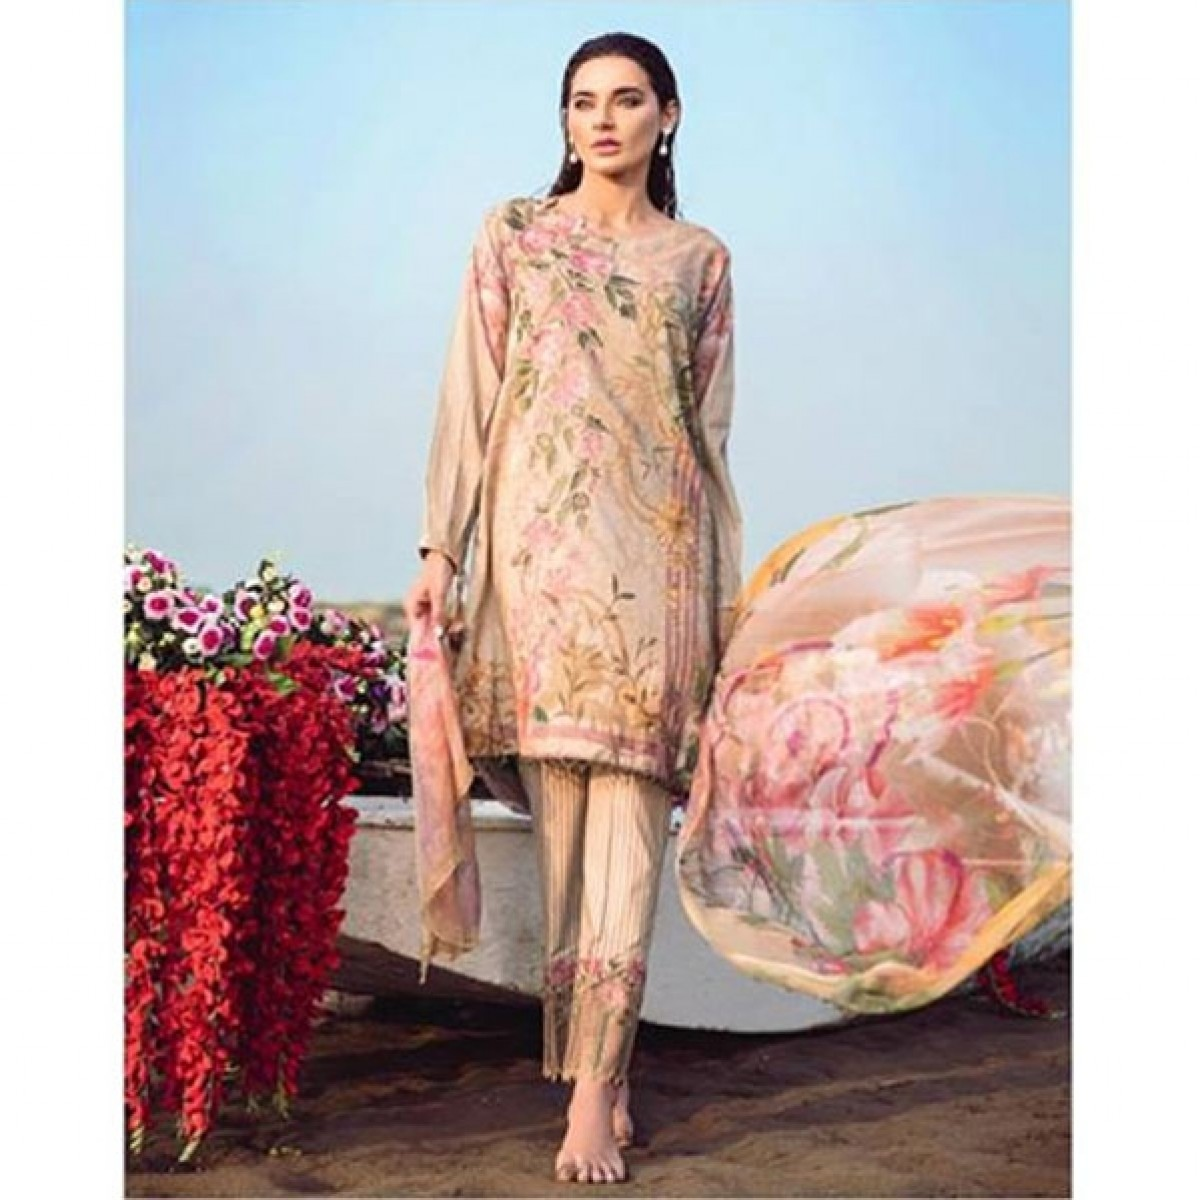 9b0d49e1e1 Iznik Chinon Women's Lawn Collection 2018 Price in Pakistan | Buy Iznik  Chinon Spinel Lawn Collection 2018 (D07) | iShopping.pk